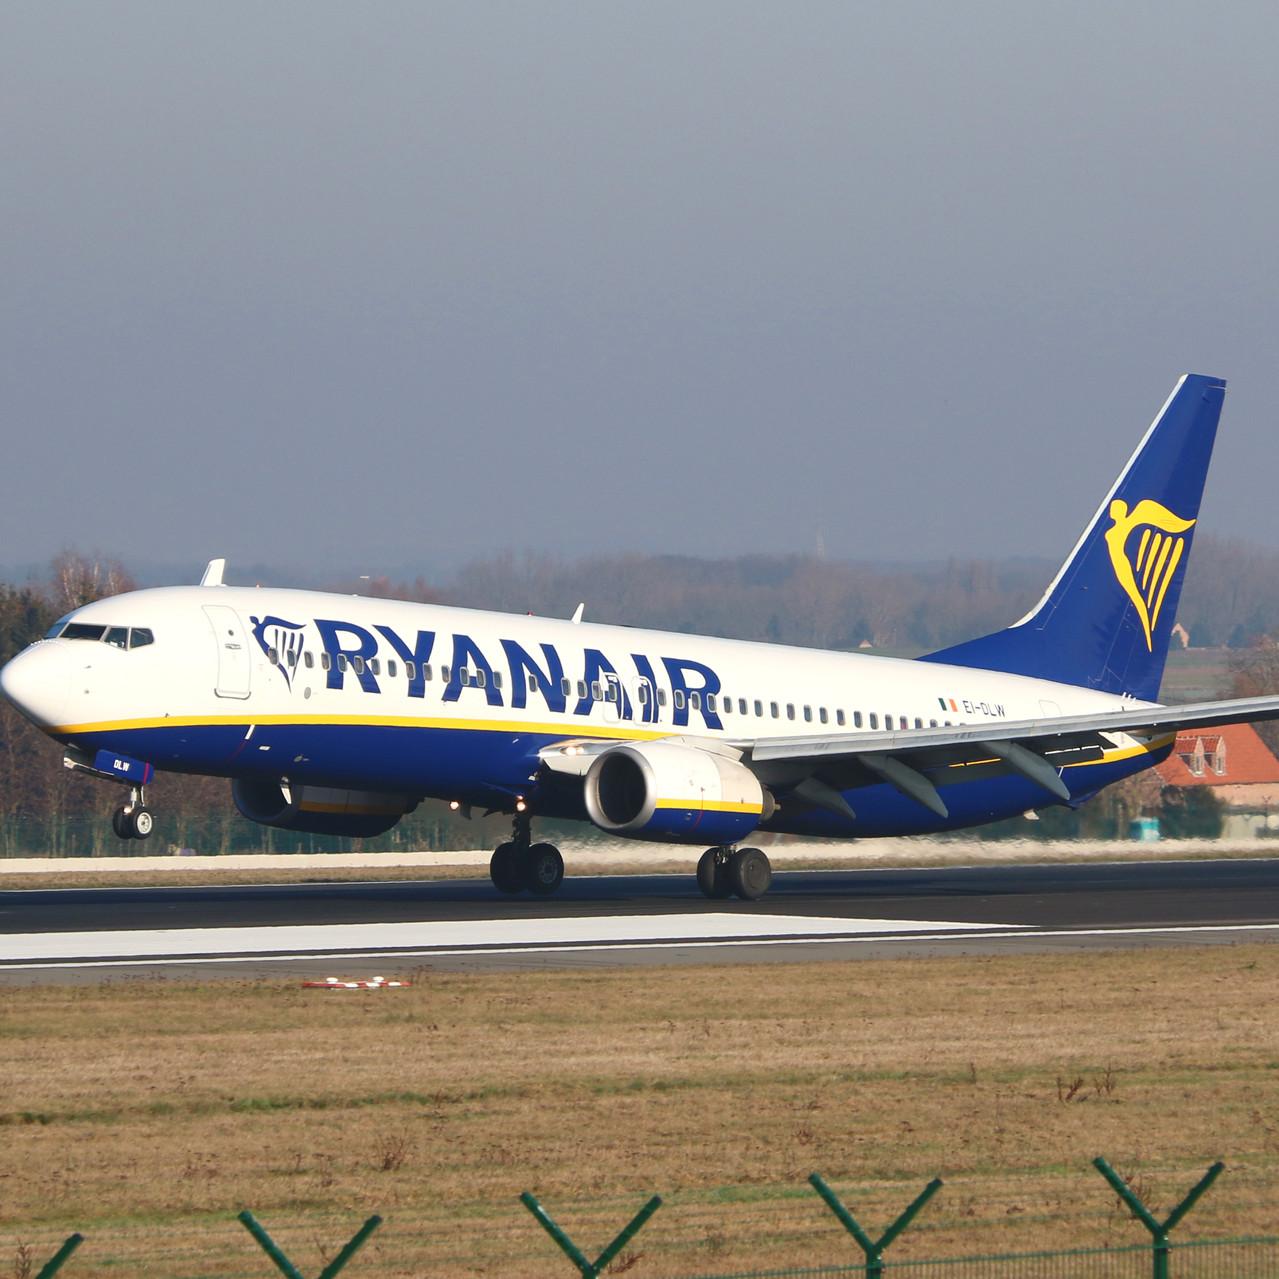 013_Tyler McDowell_3382_Ryanair 737